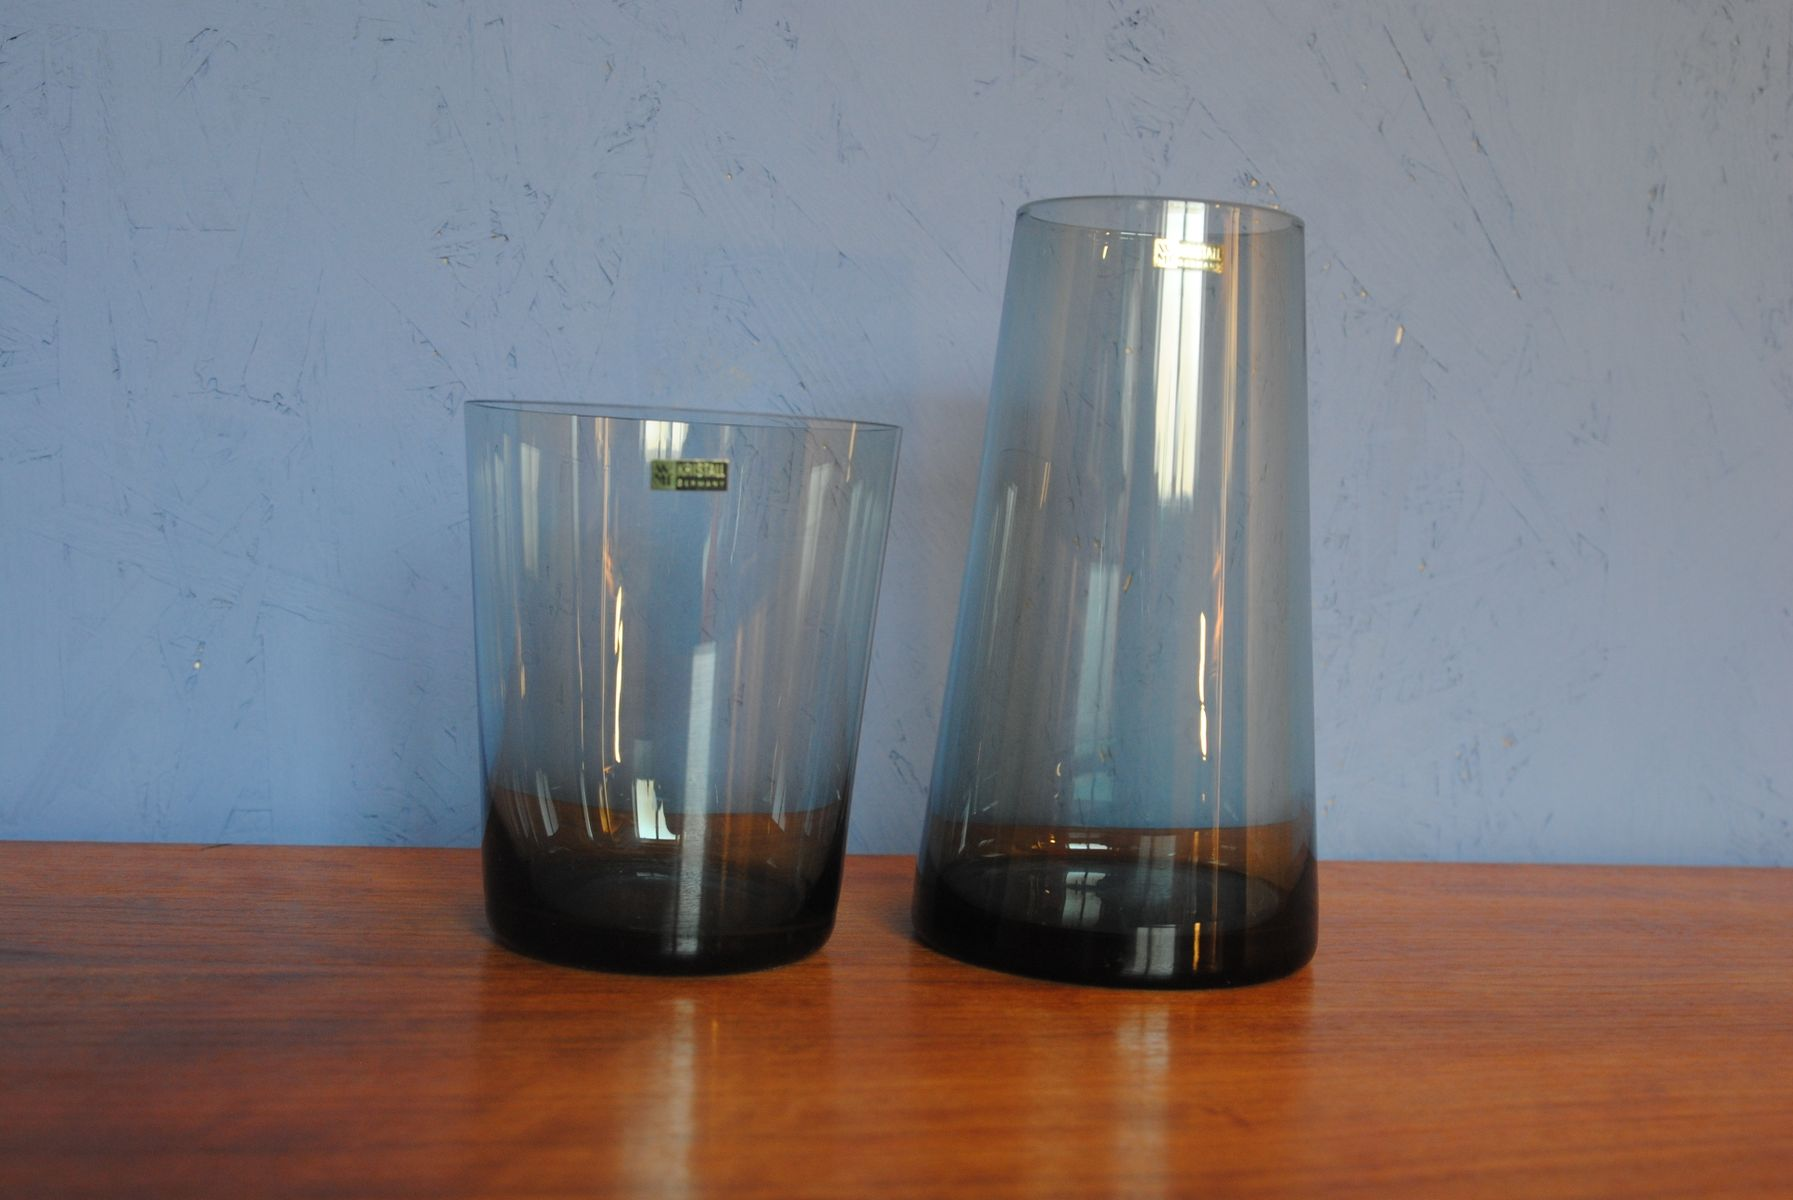 Mid century tinted glass trio vases by wilhelm wagenfeld for wmf mid century tinted glass trio vases by wilhelm wagenfeld for wmf 1958 set of 2 for sale at pamono reviewsmspy